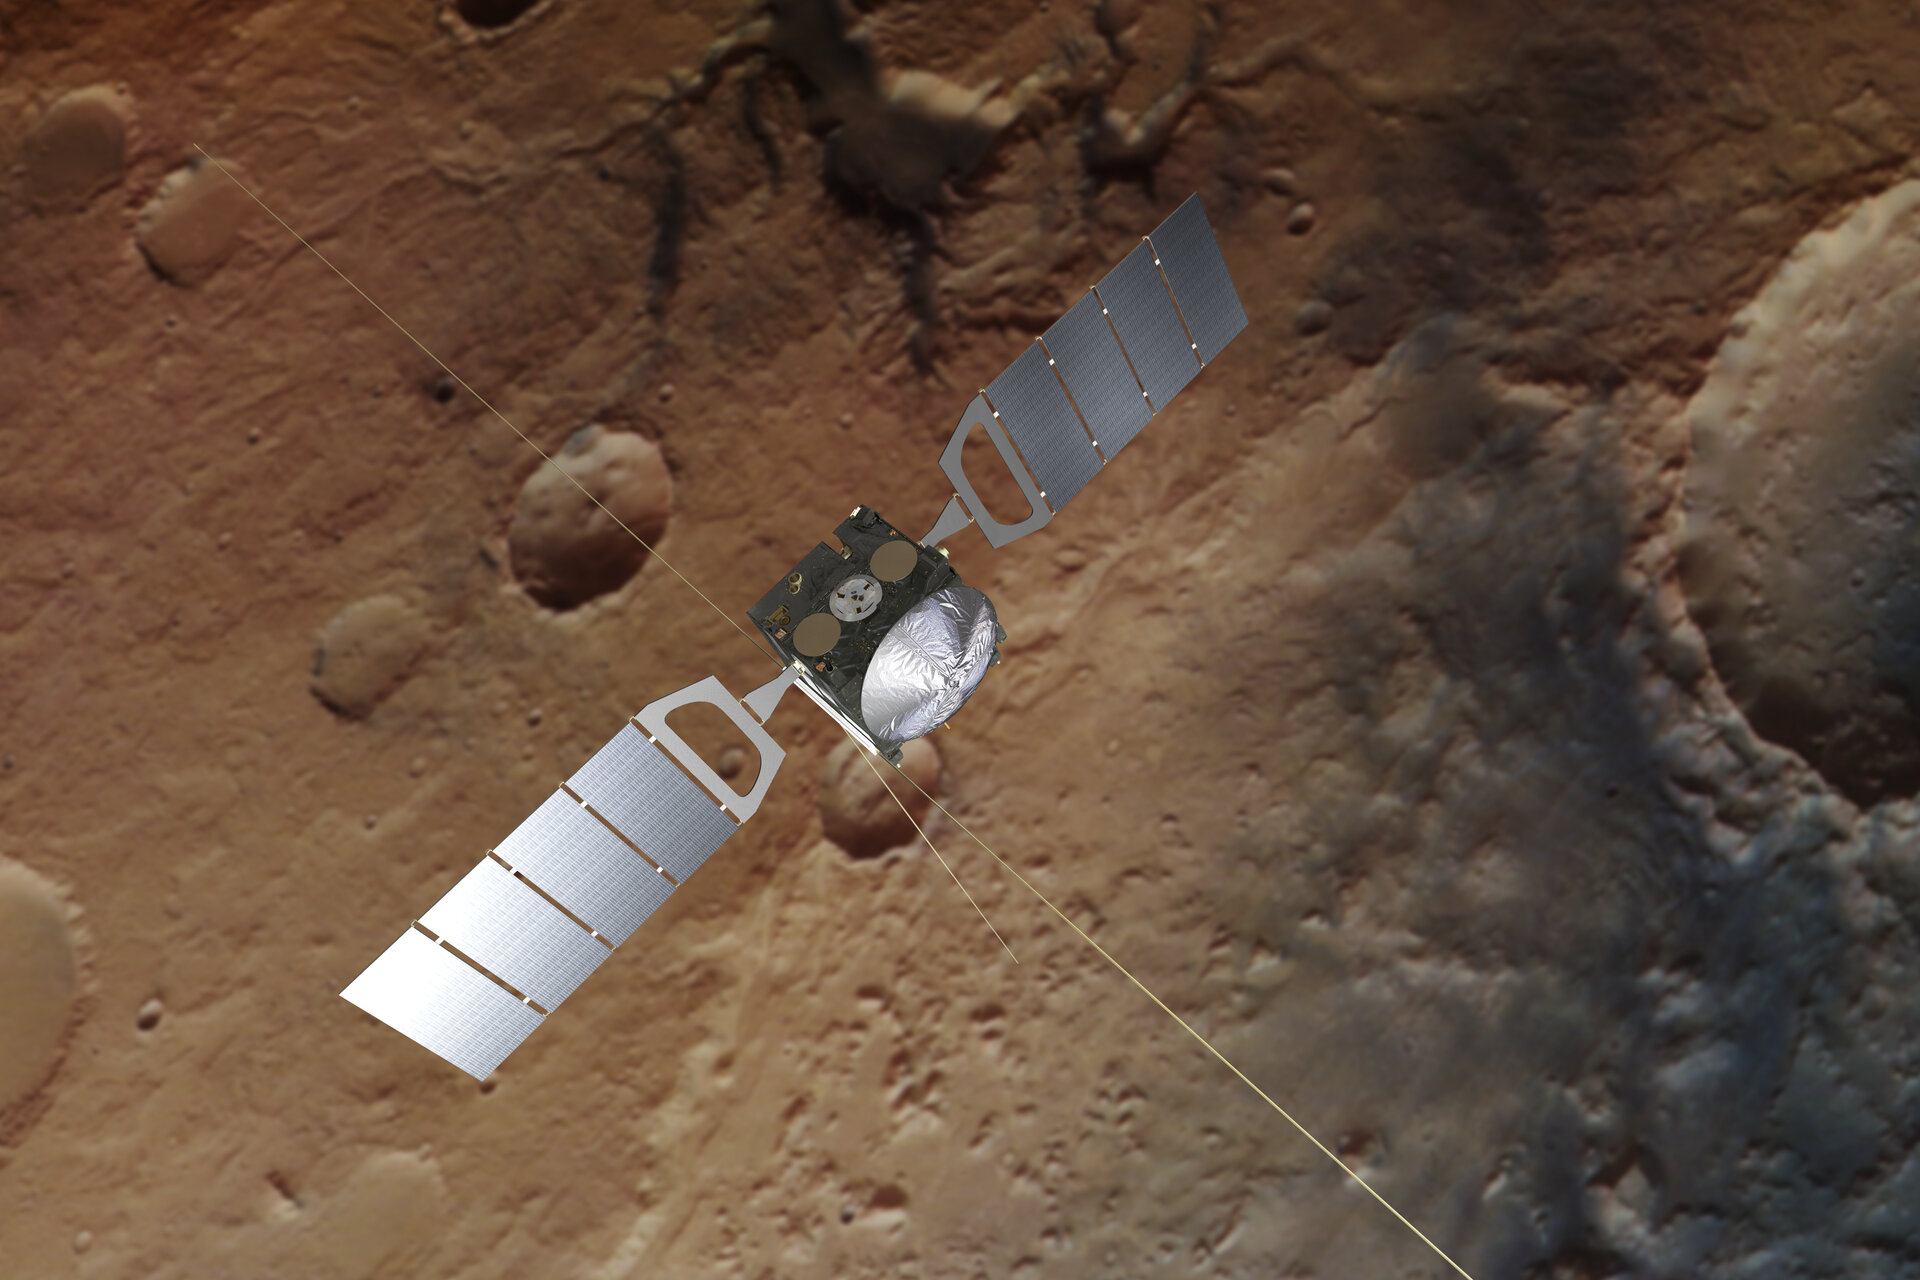 Mars Express con i suoi due bracci radar lunghi 20 m